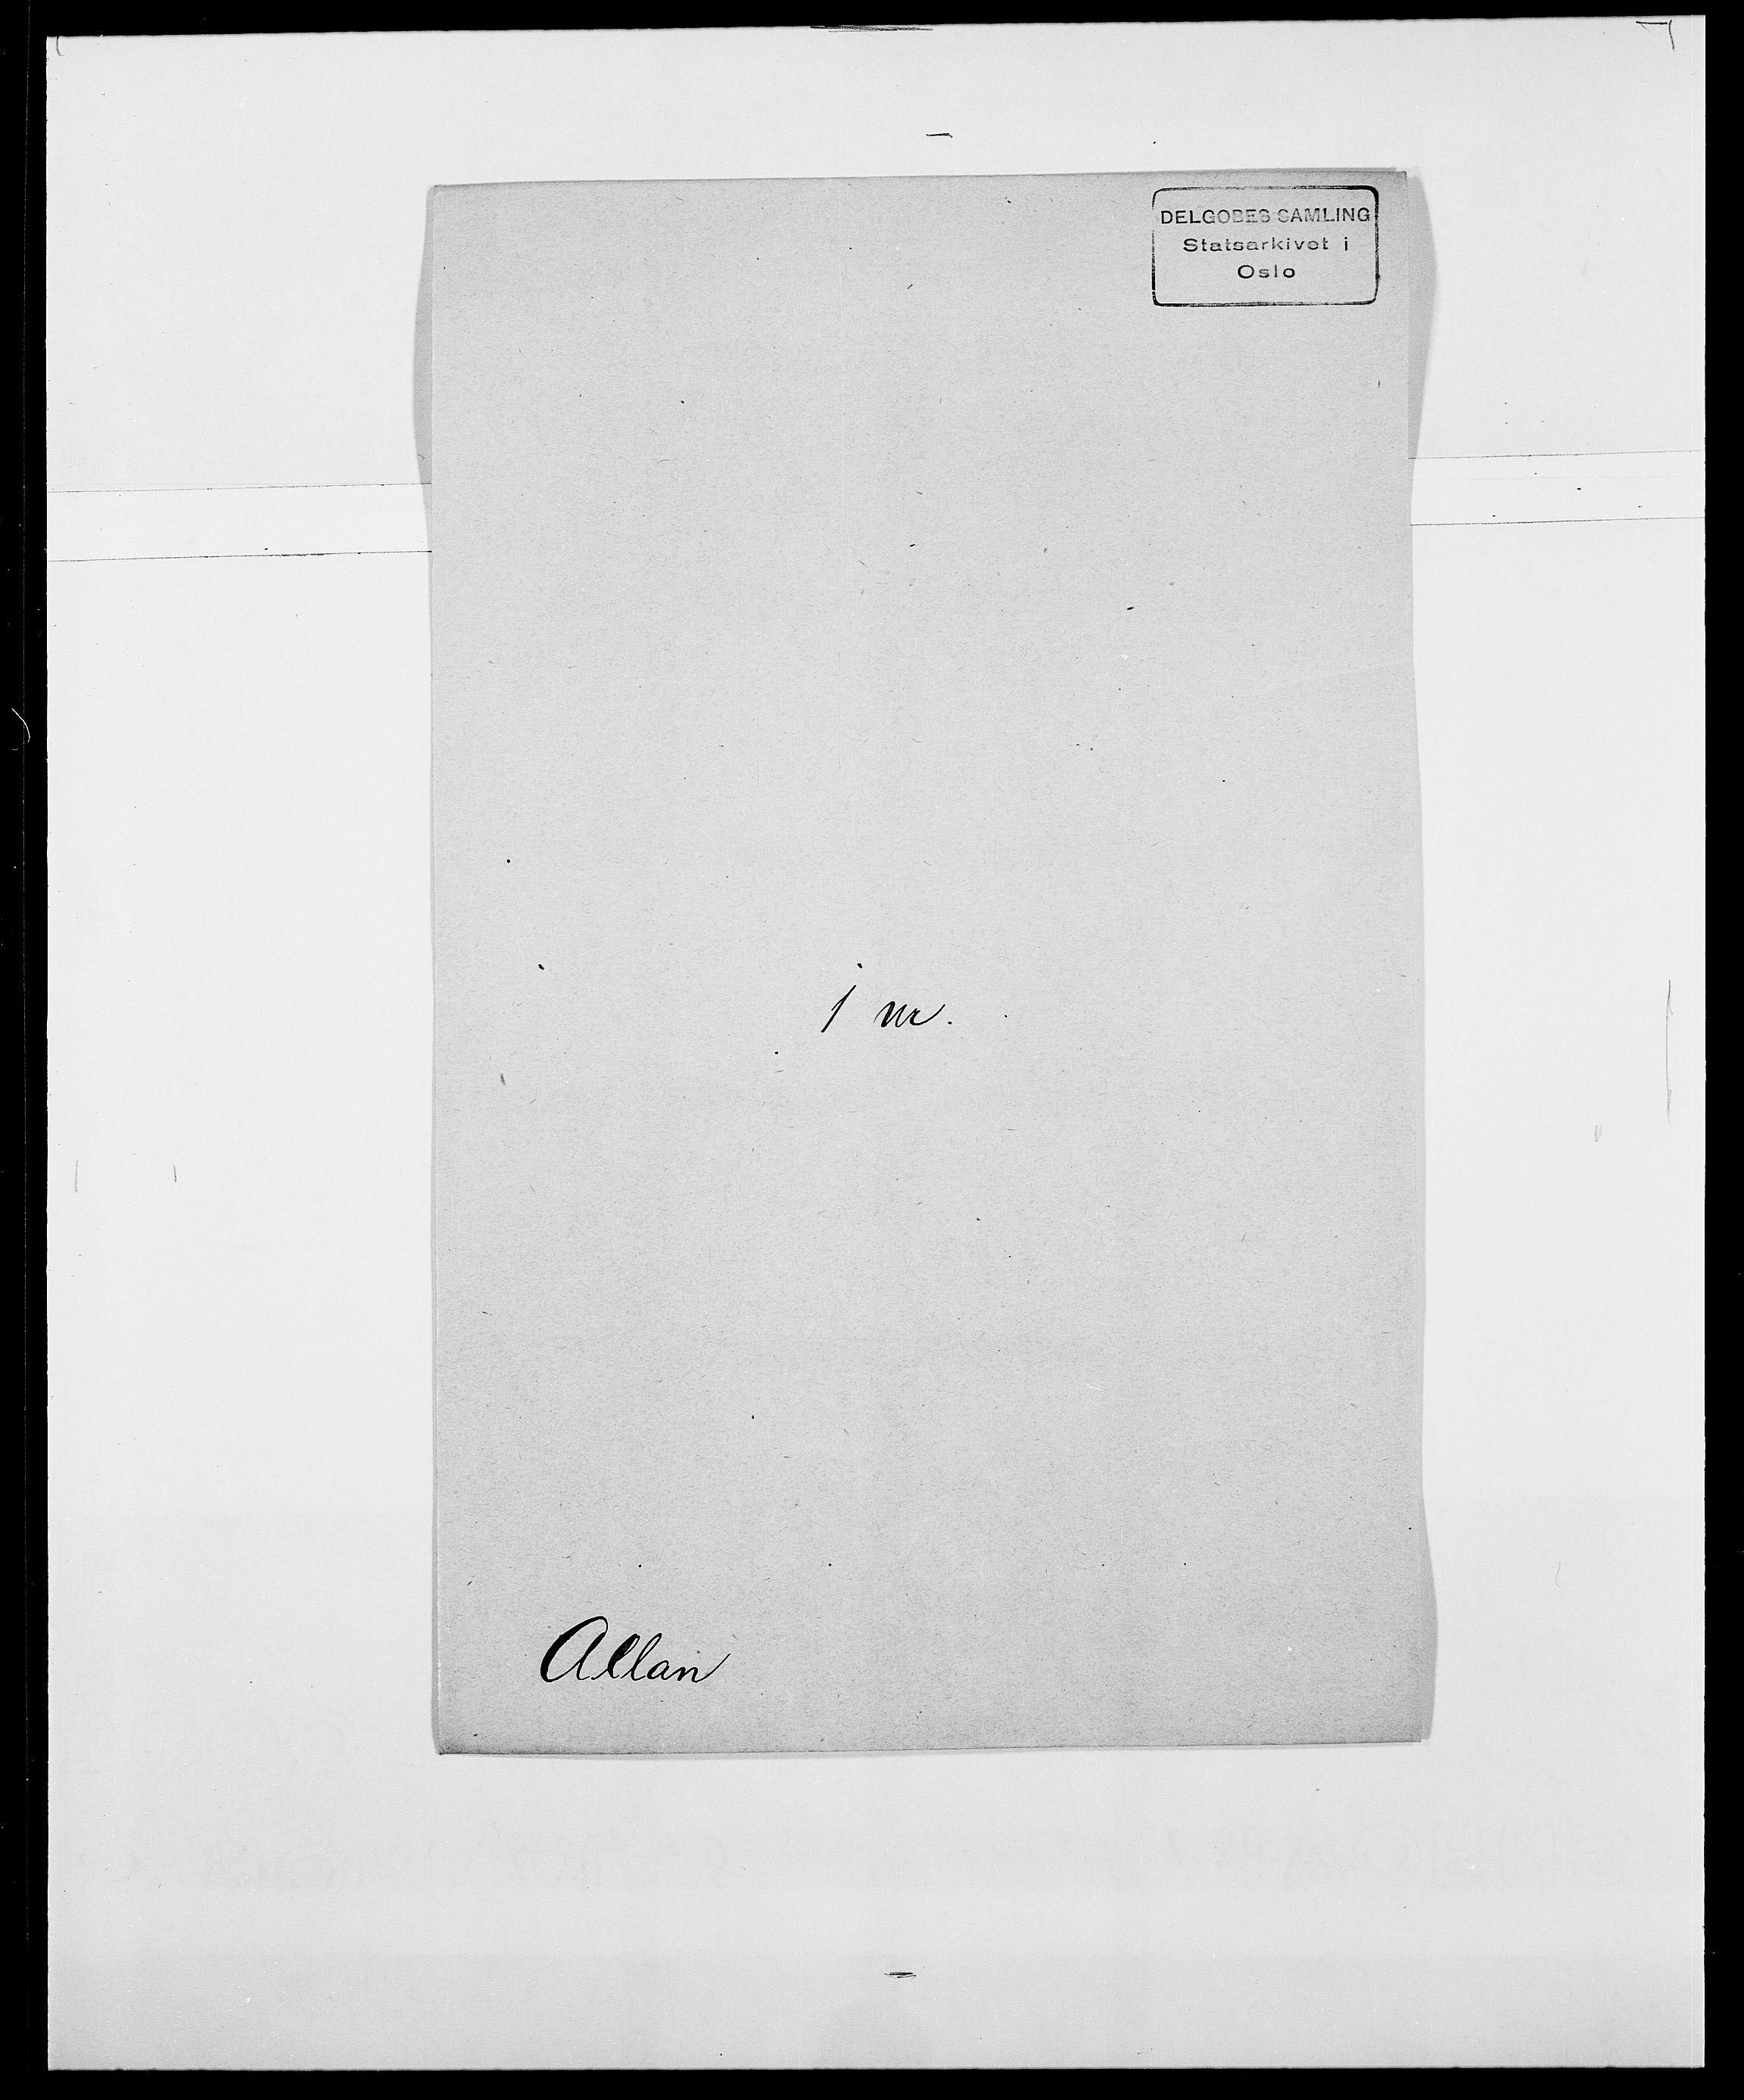 SAO, Delgobe, Charles Antoine - samling, D/Da/L0001: Aabye - Angerman, s. 412